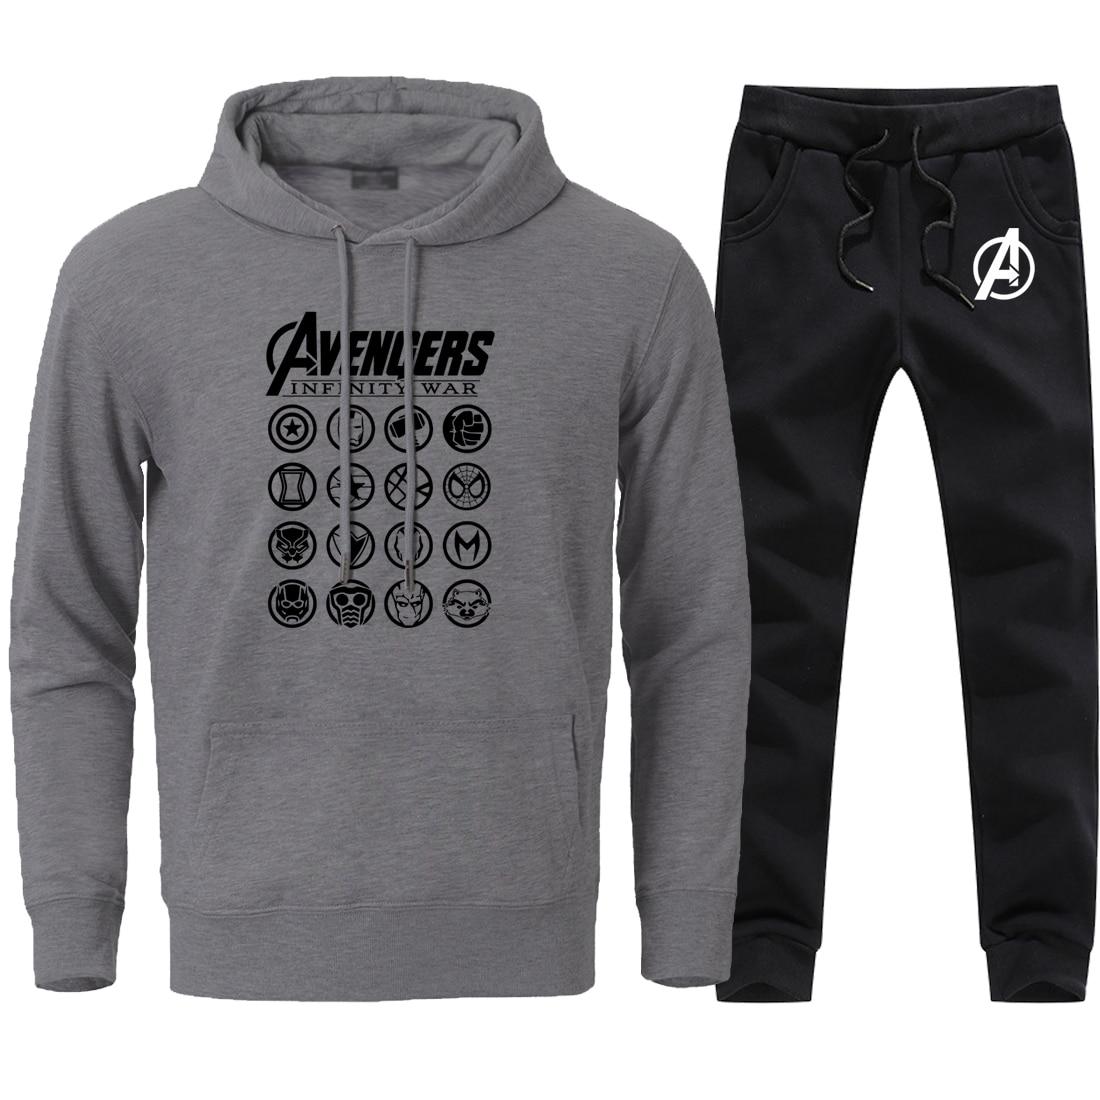 Fashion The Avengers Print Sweatshirts Mens 2 Pieces Streetwear Sweatpants Sets 2020 Man Brand Hip Hop Pants+Hoodies Black Sets